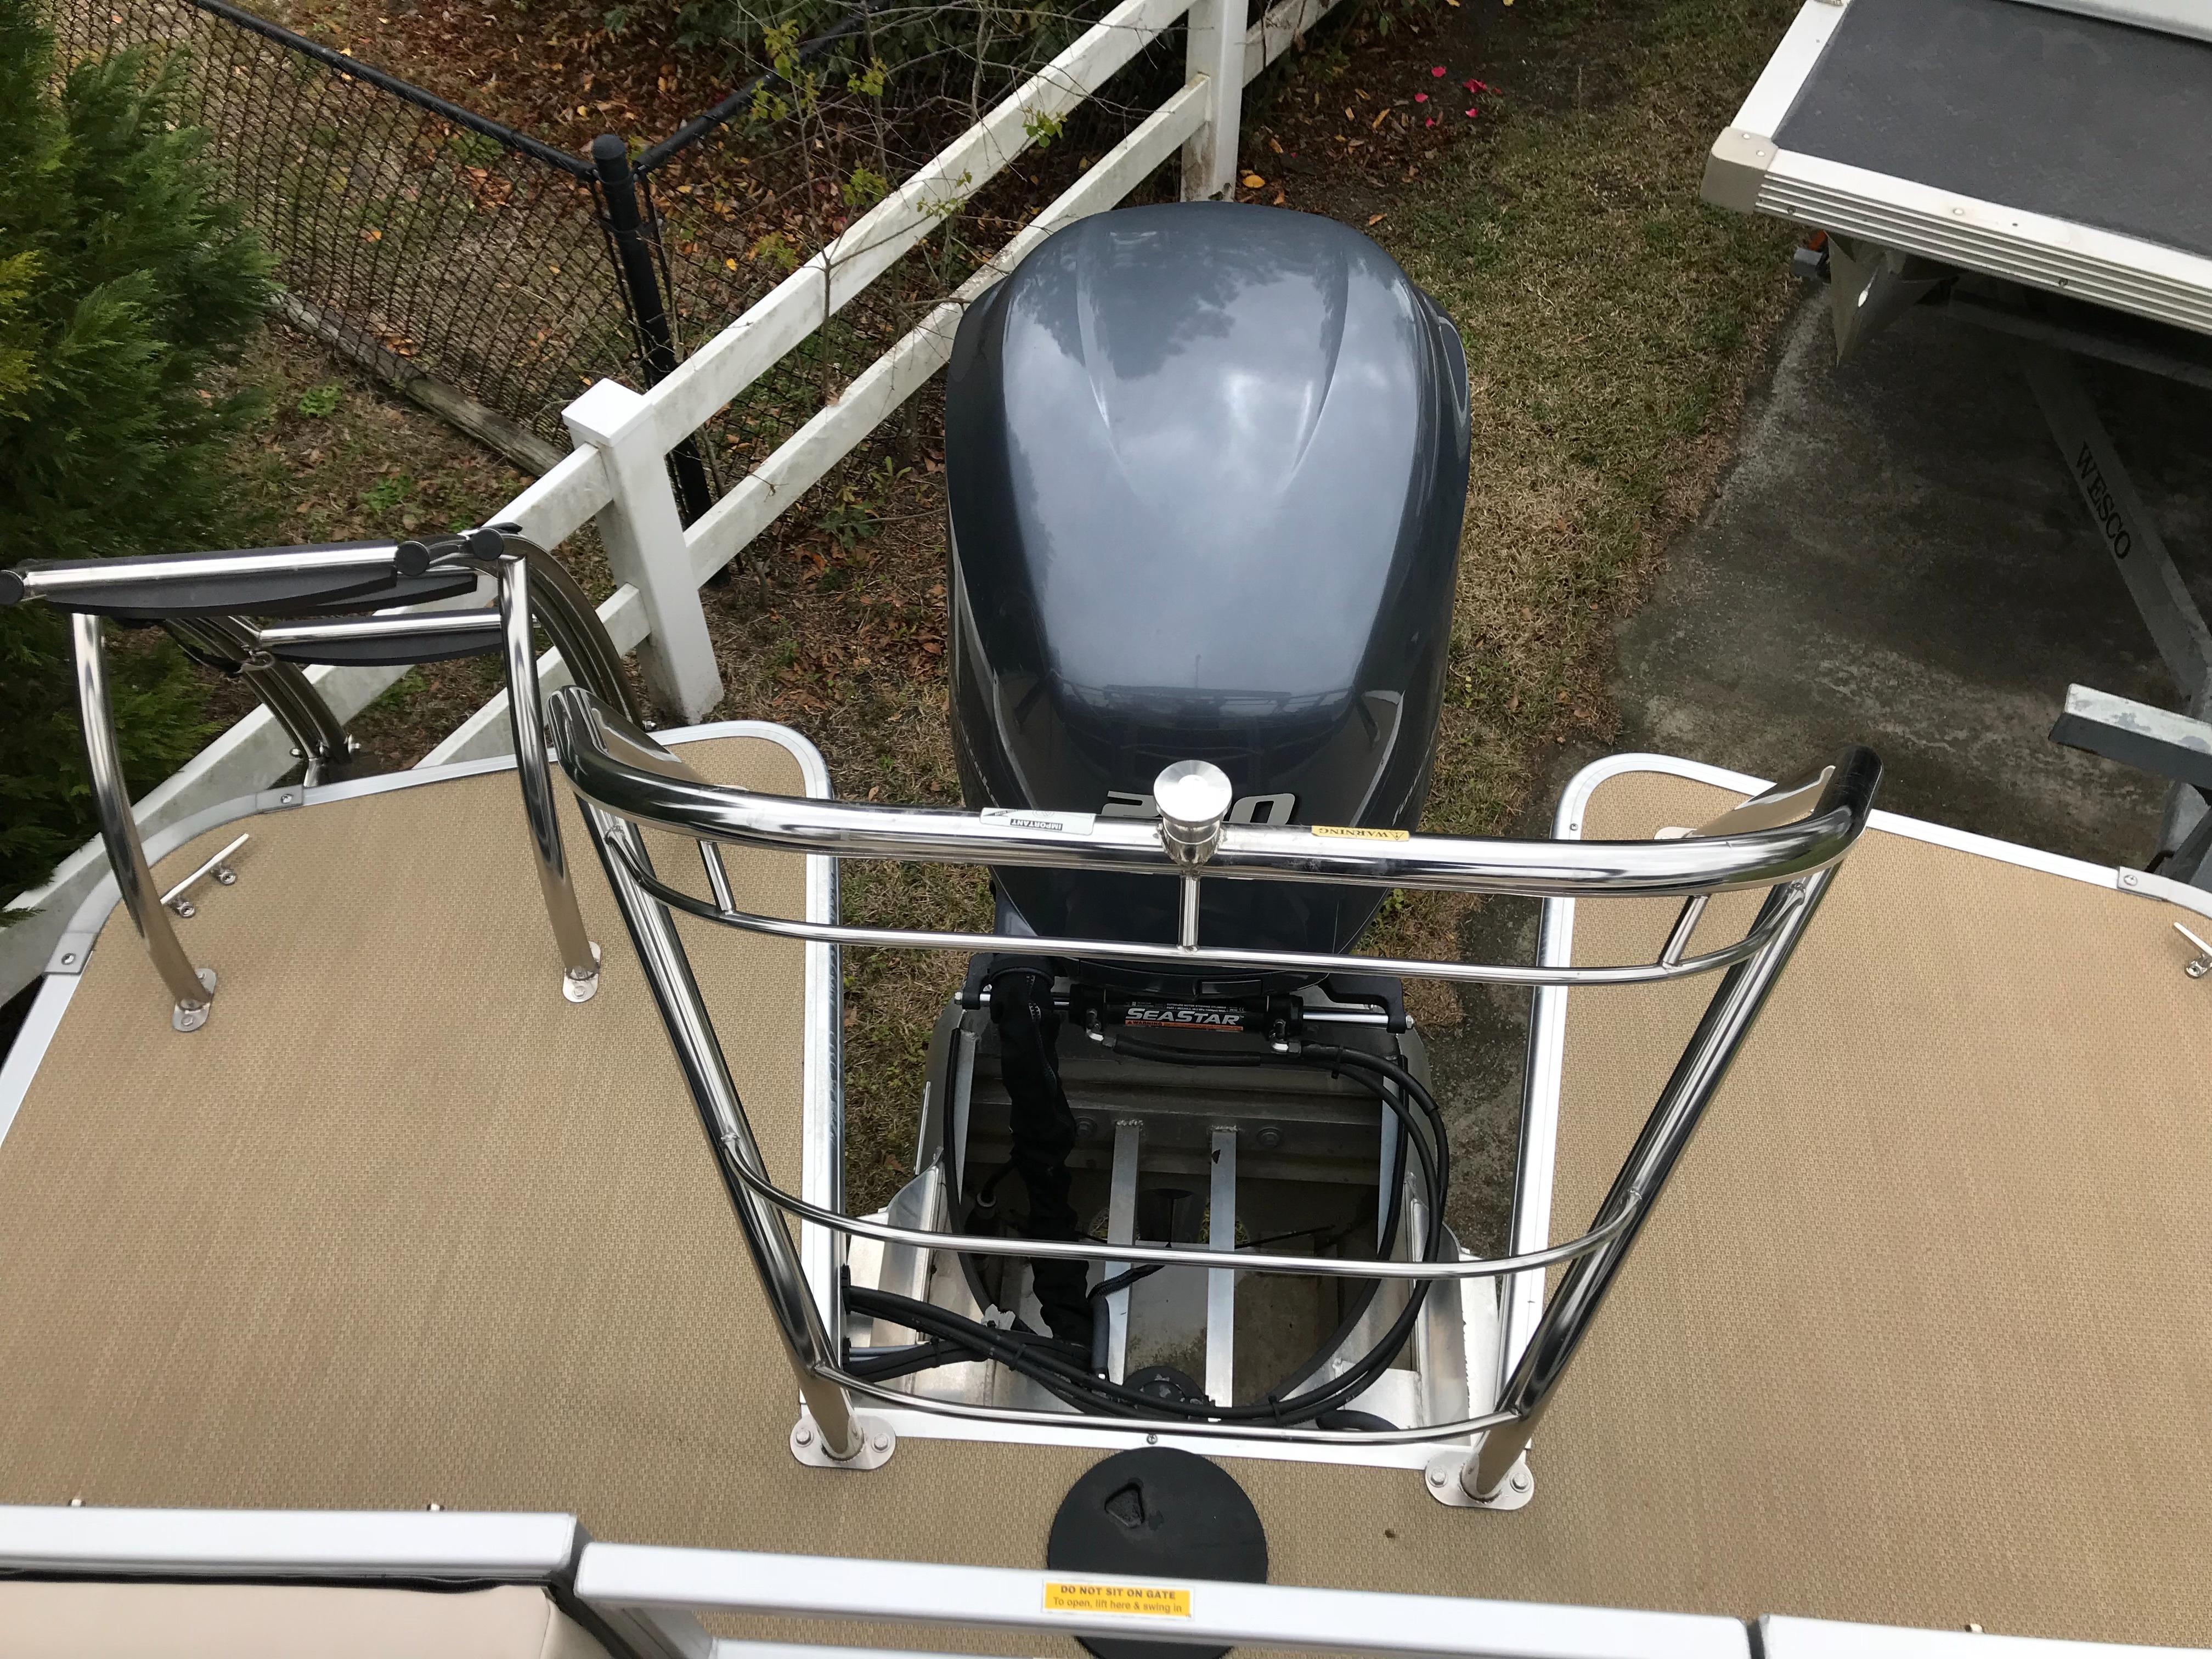 Godfrey Aqua Patio - Ski Tow Bar/Swim Ladder/Aft Deck